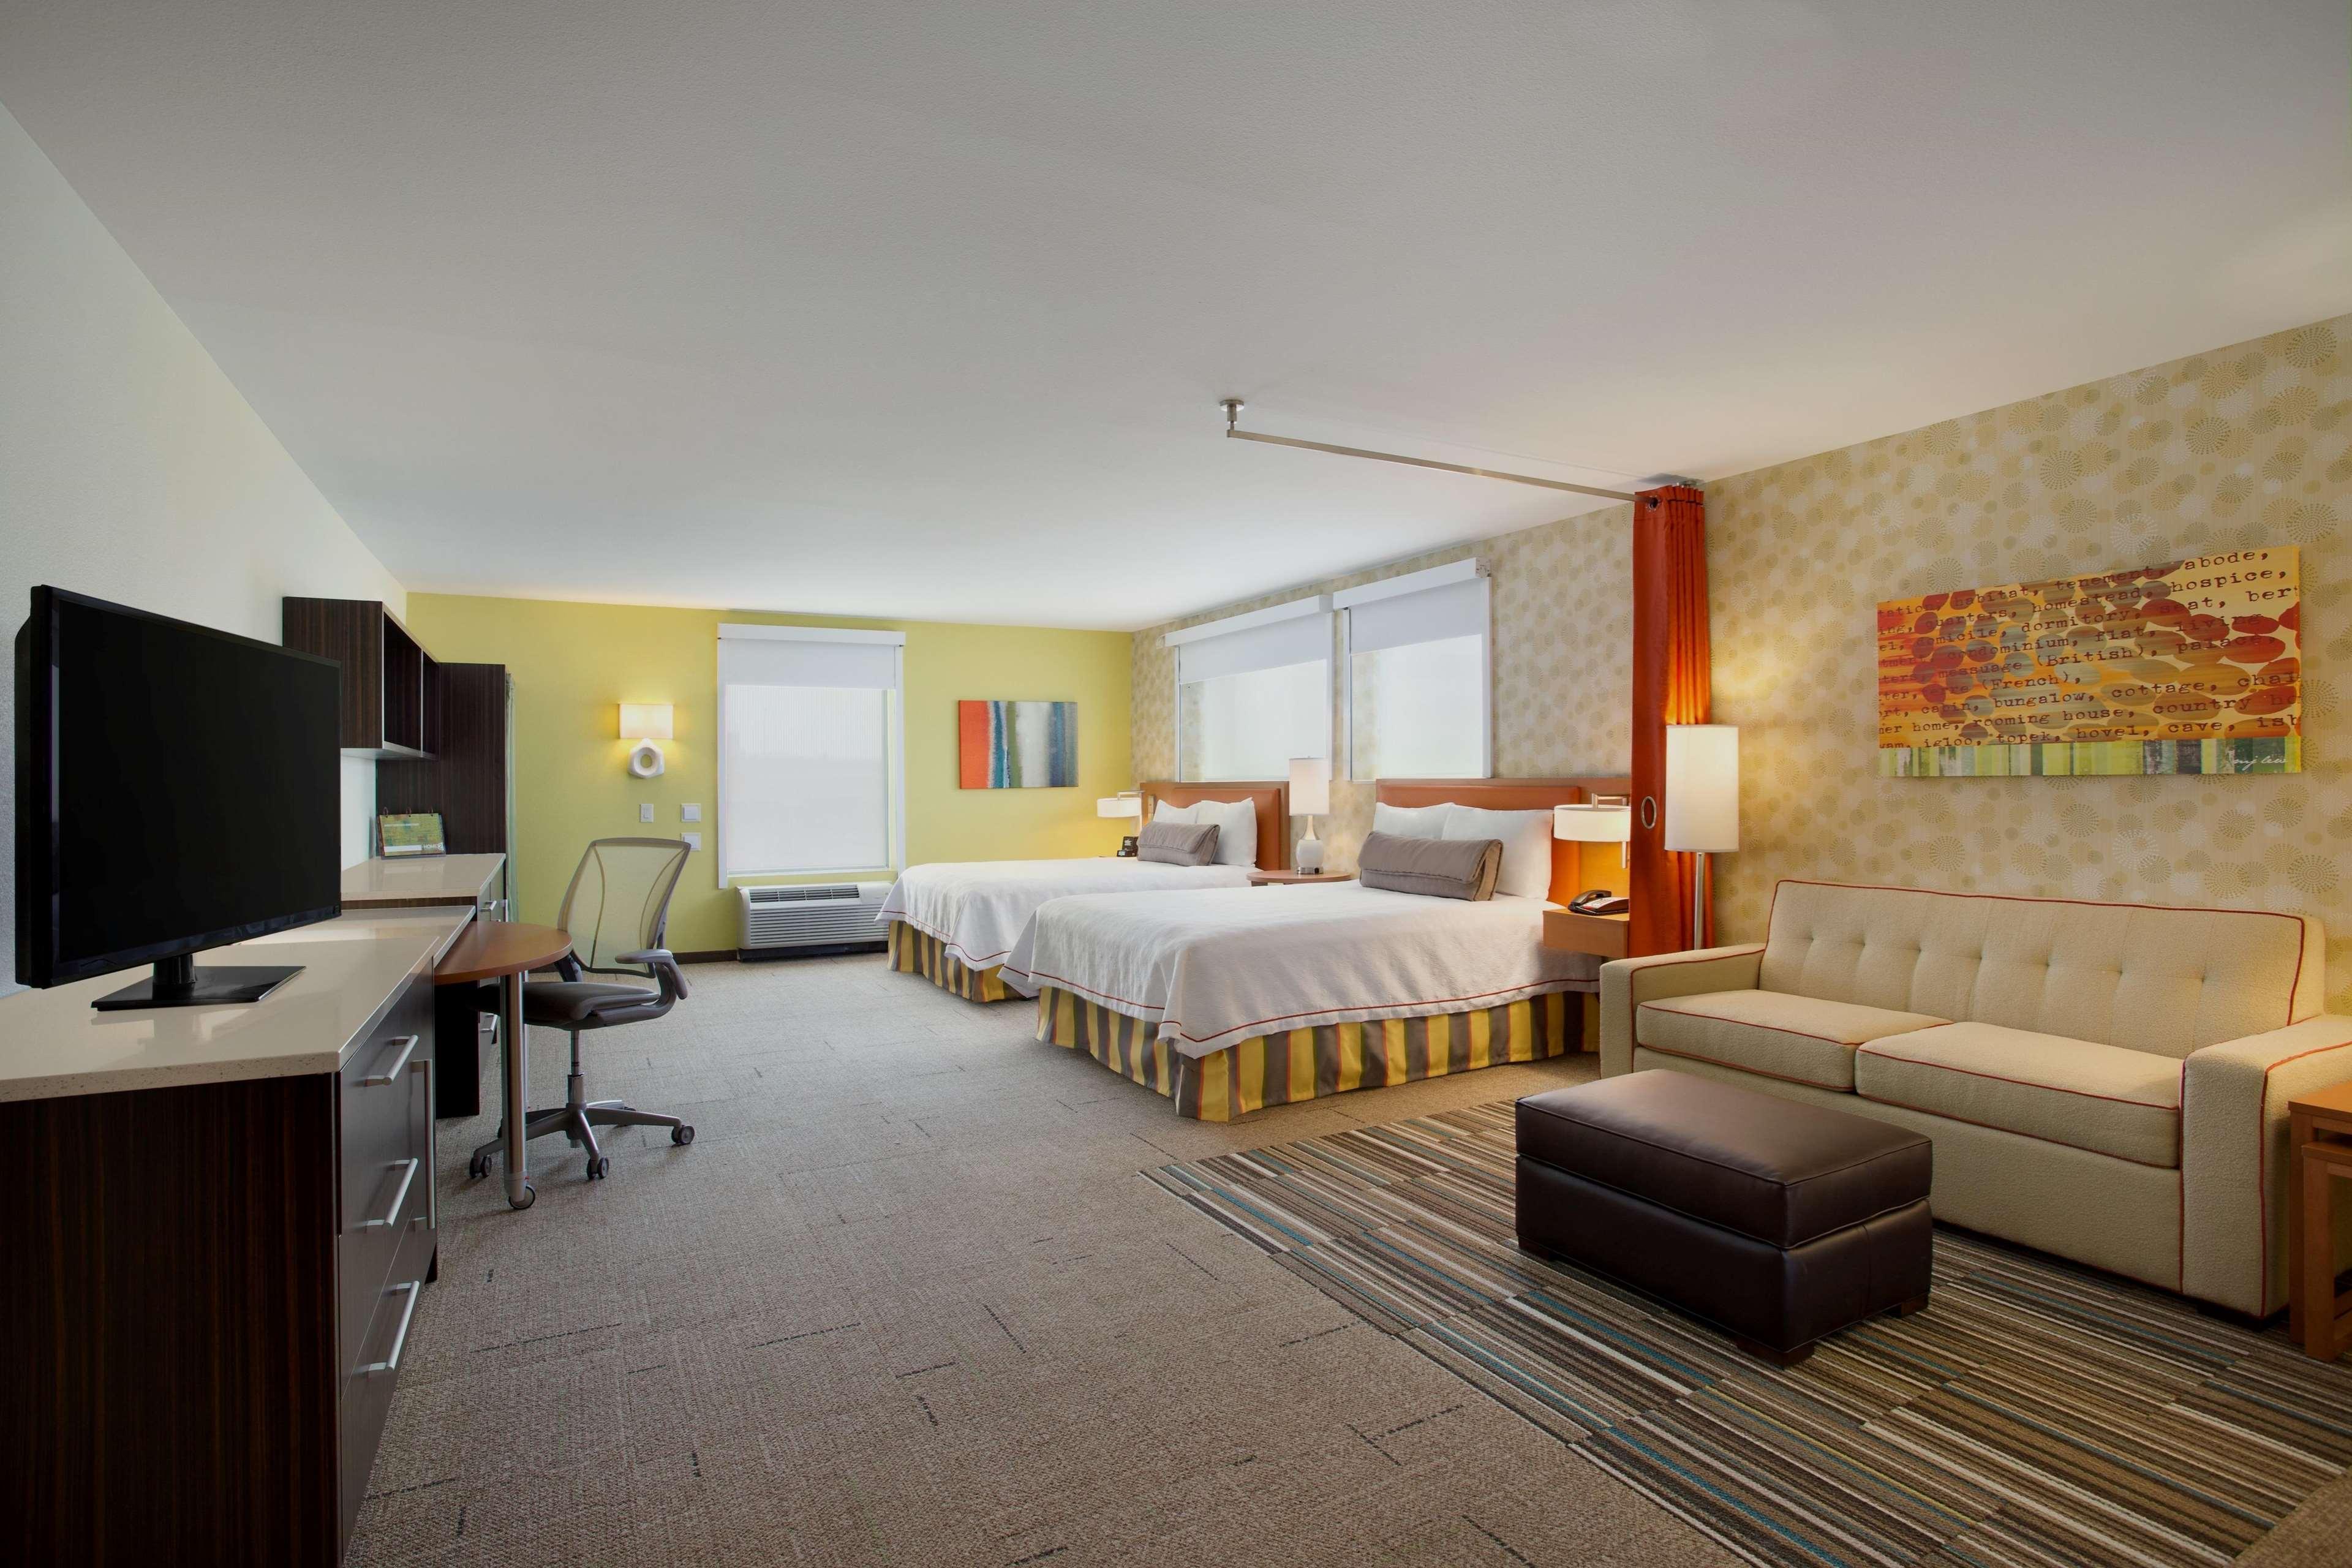 Home2 Suites by Hilton San Antonio Airport, TX image 19